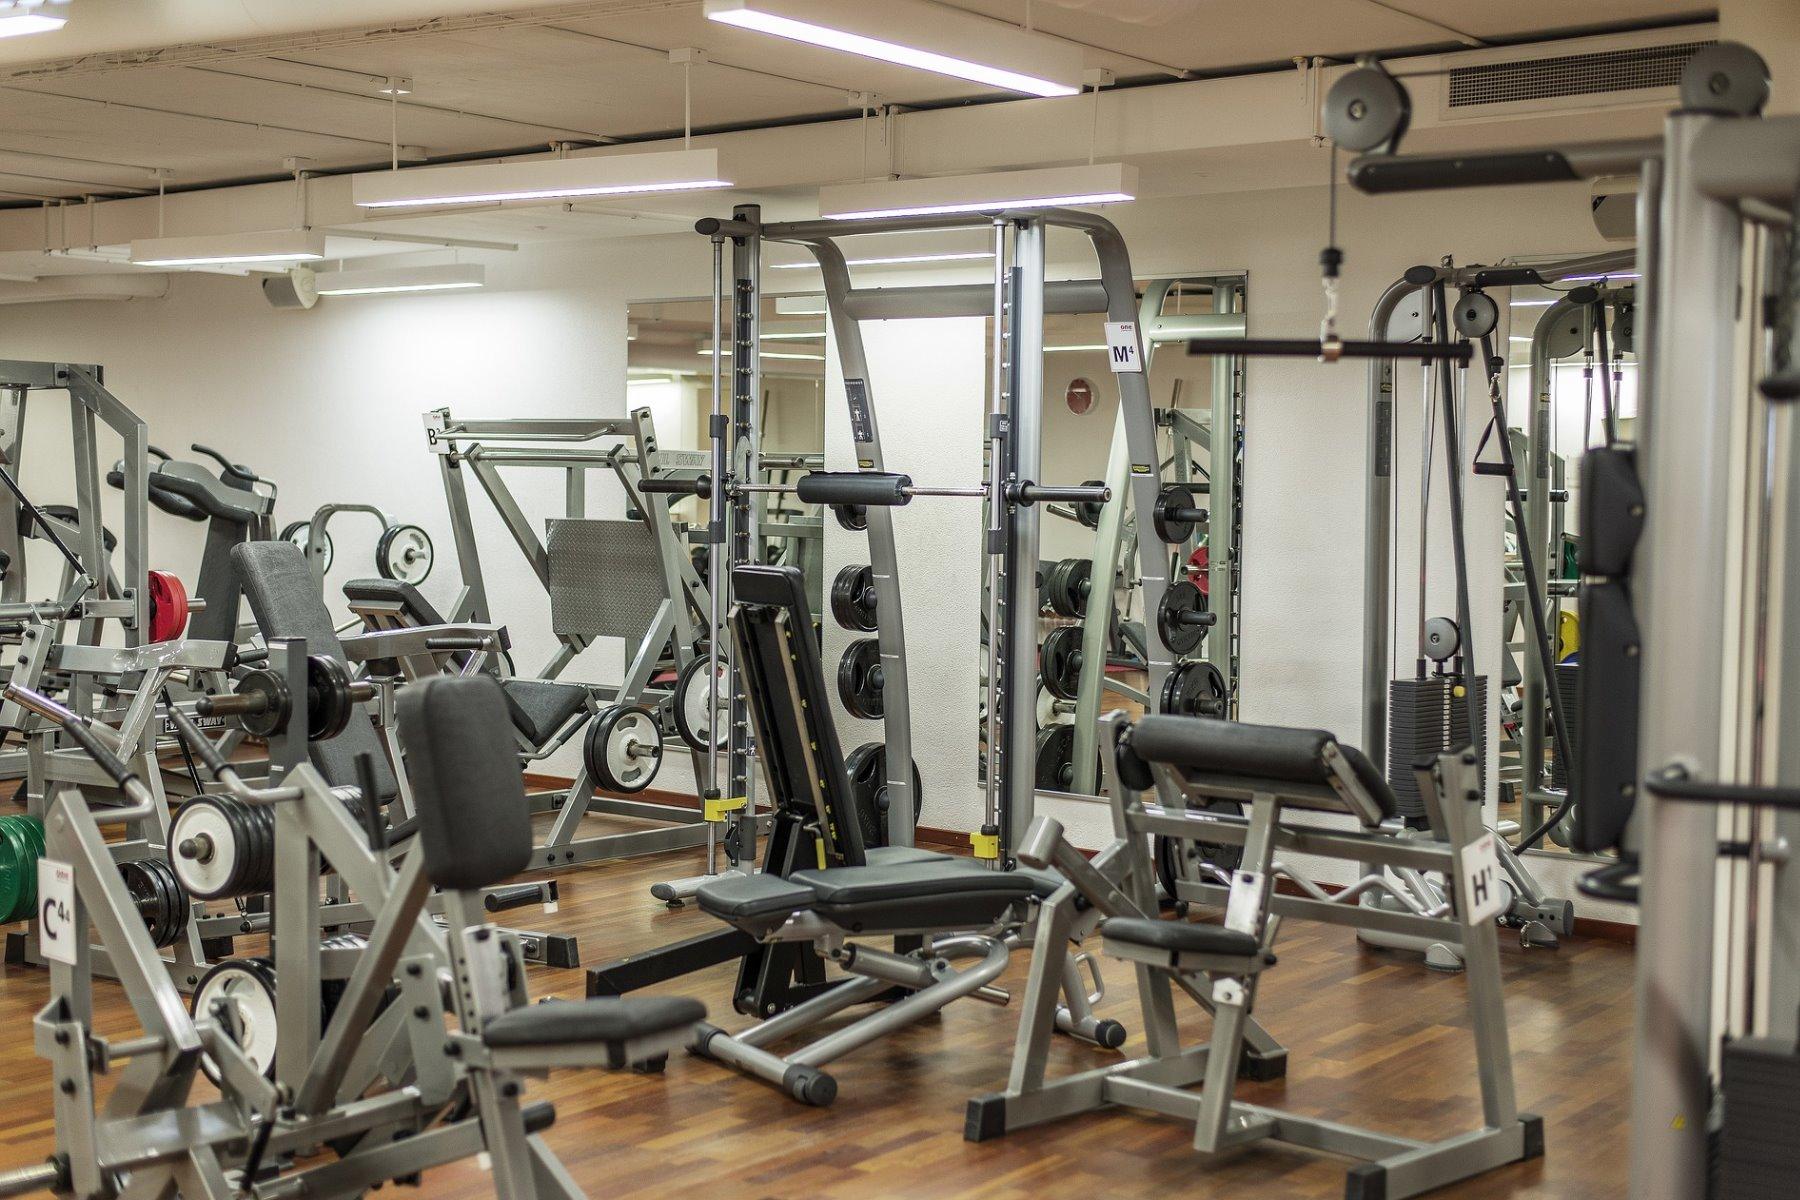 Fitnessstudios brauchen Klarheit